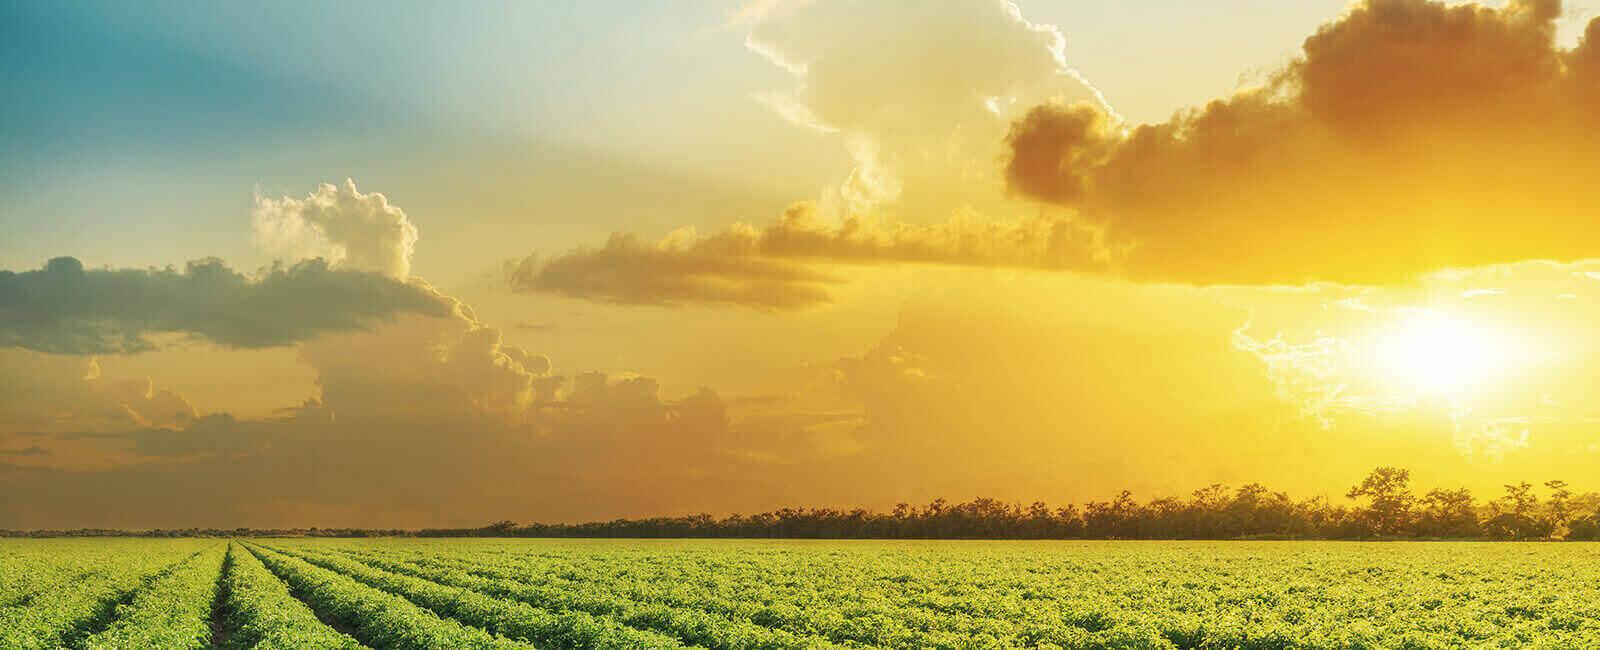 Sunrise over farm field